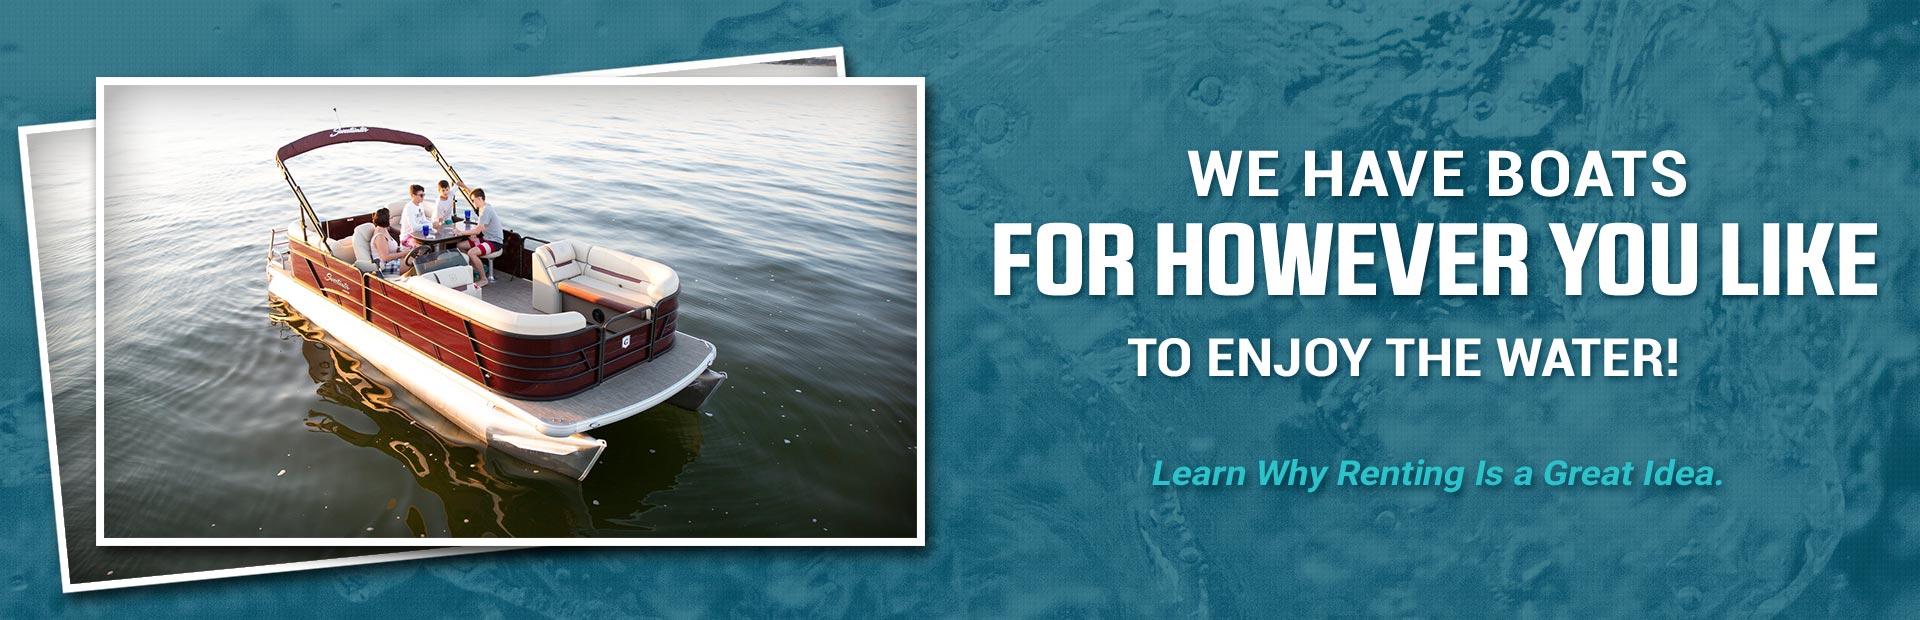 Shop Pontoons, Aluminum Fishing Boats, Outboards, Docks